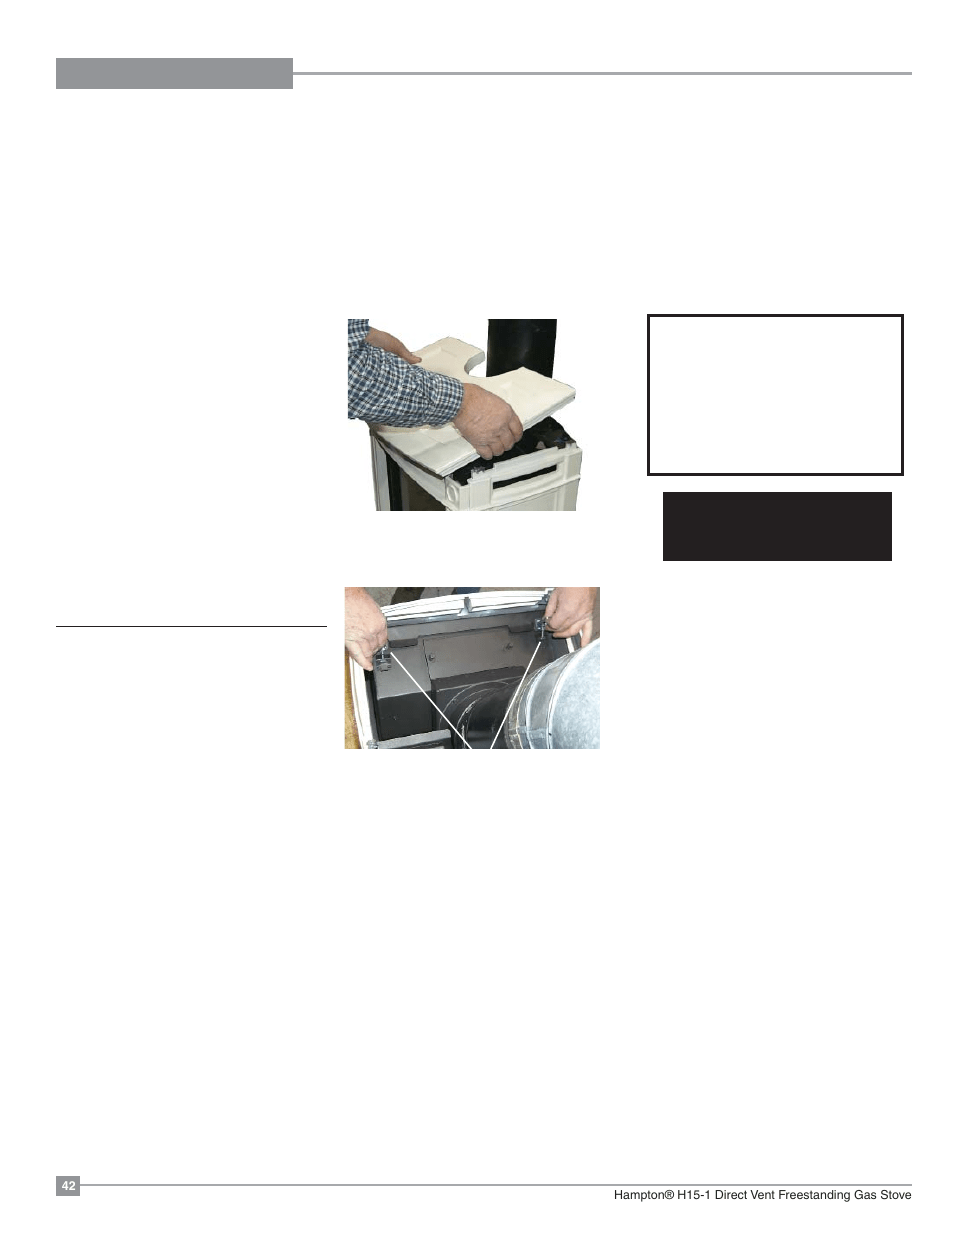 Maintenance, Fan maintenance, General vent maintenance